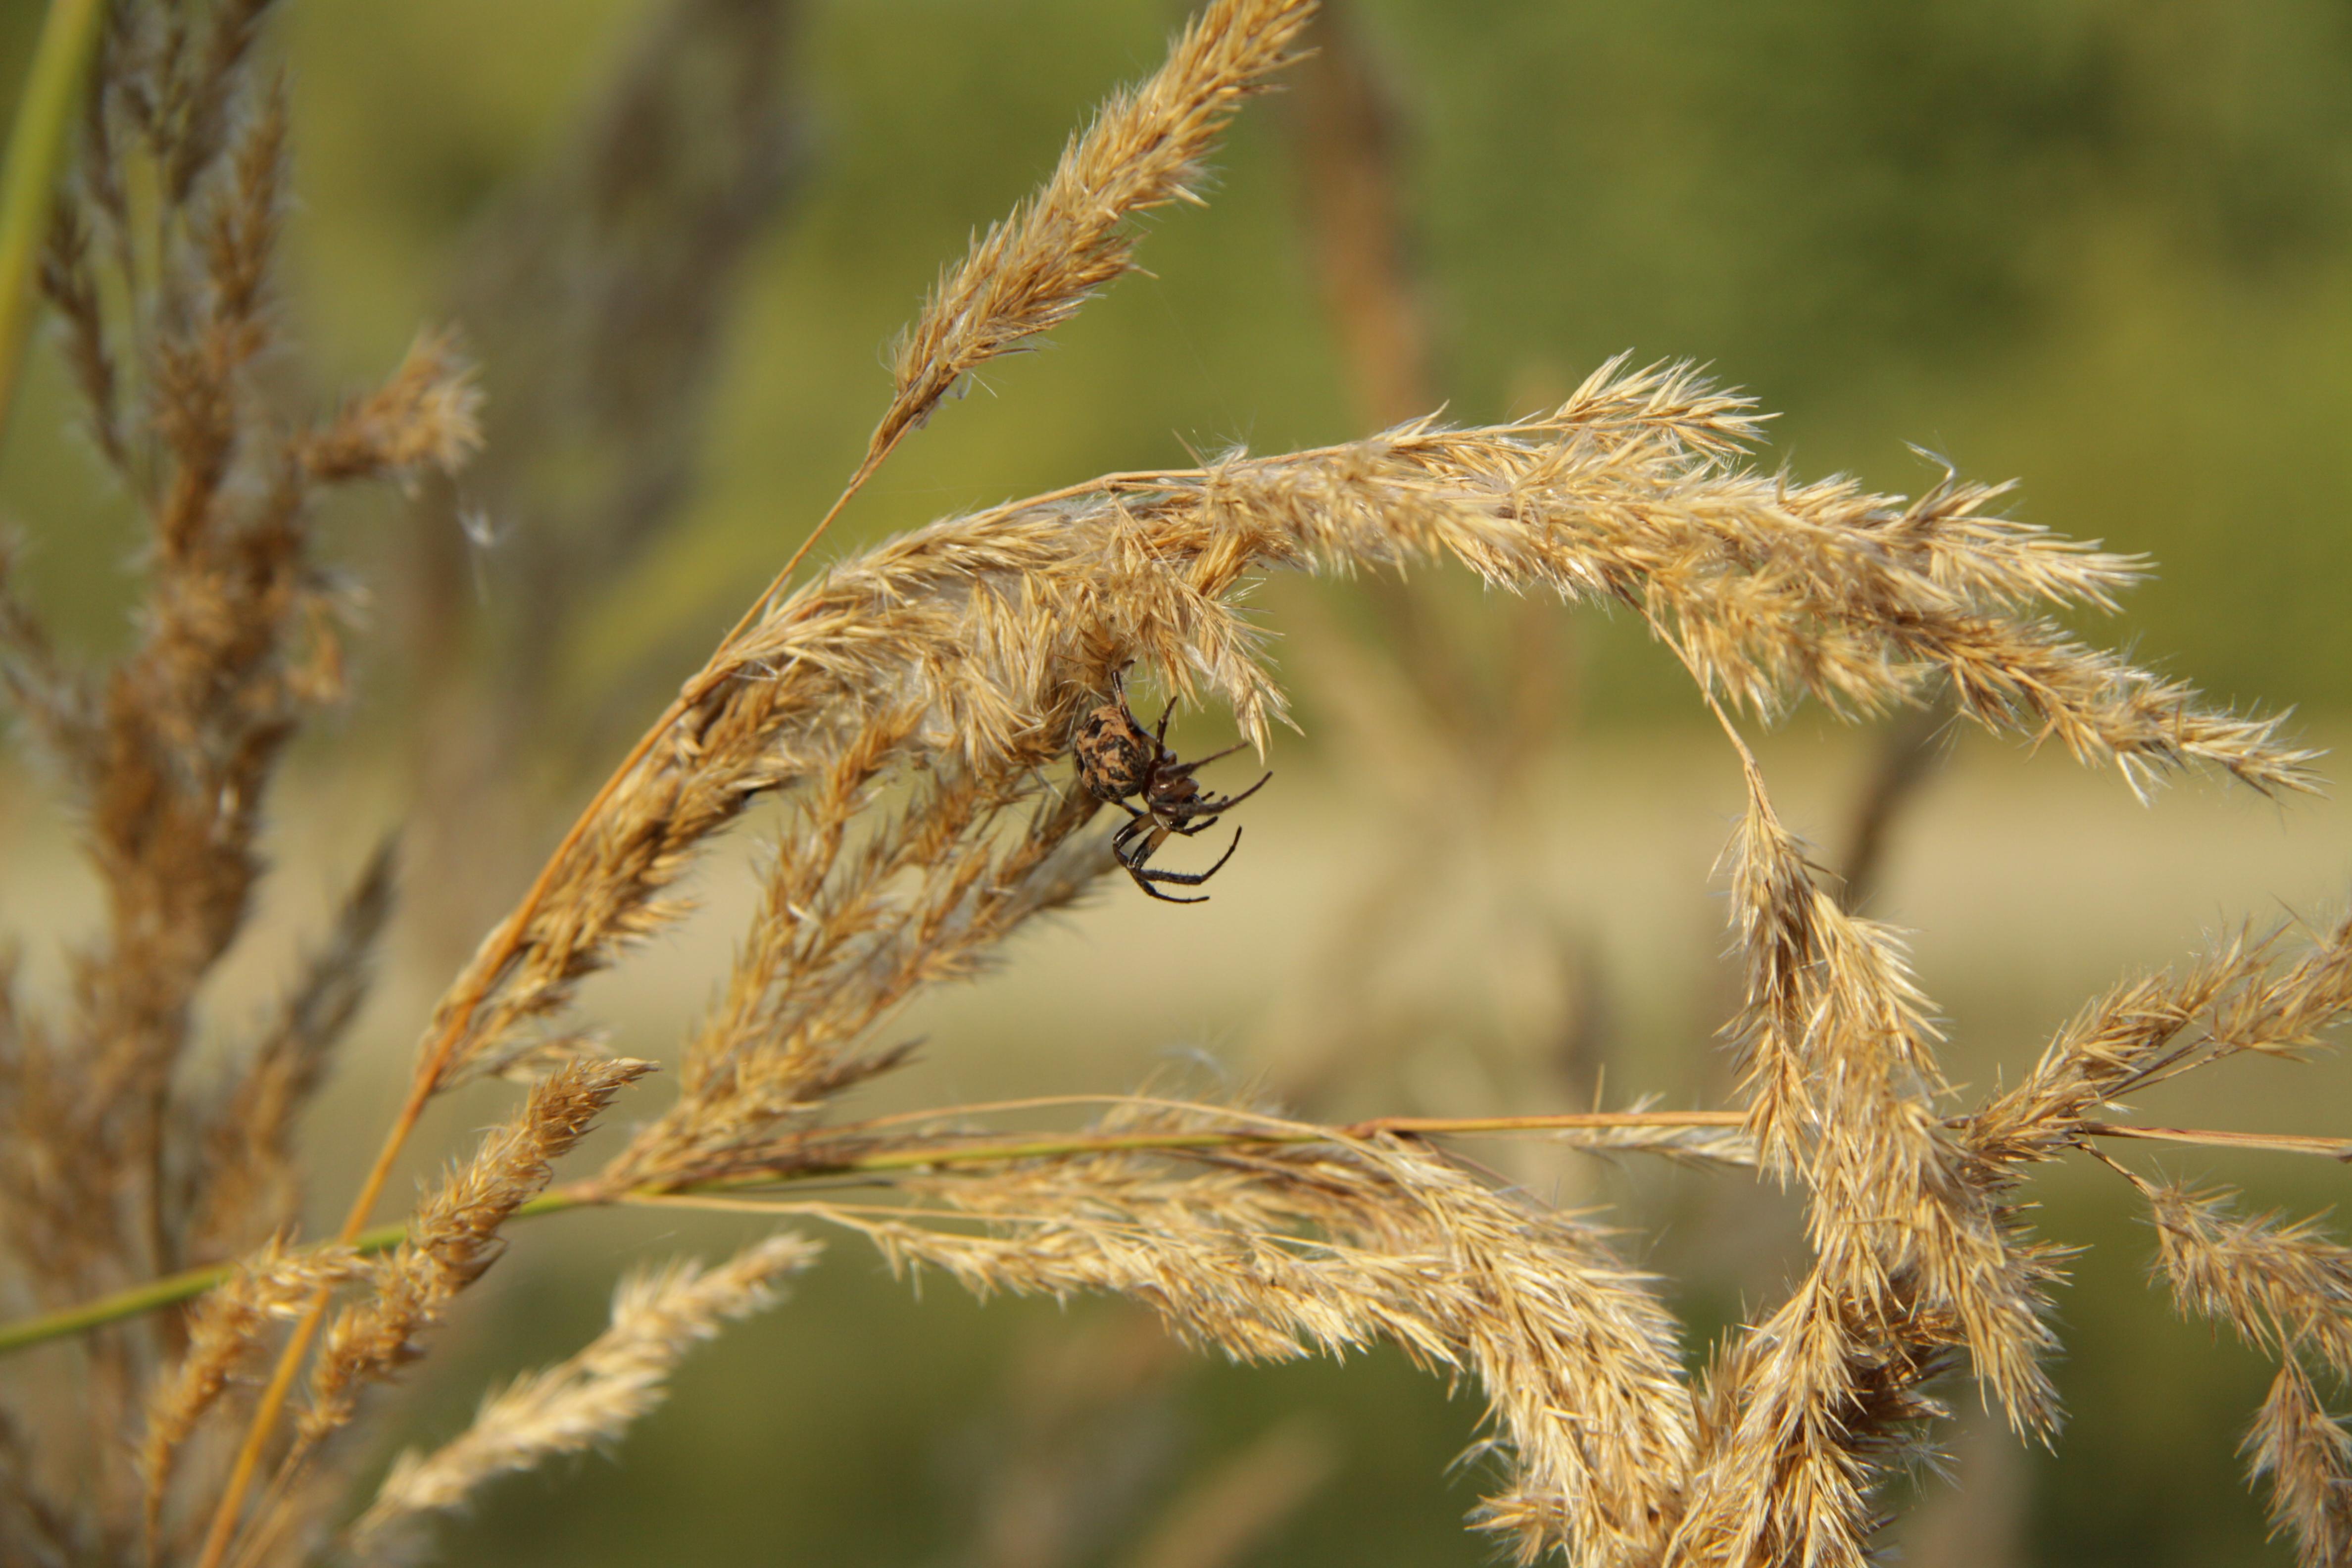 Spider in natural monument Zeman in 2011 (2).JPG